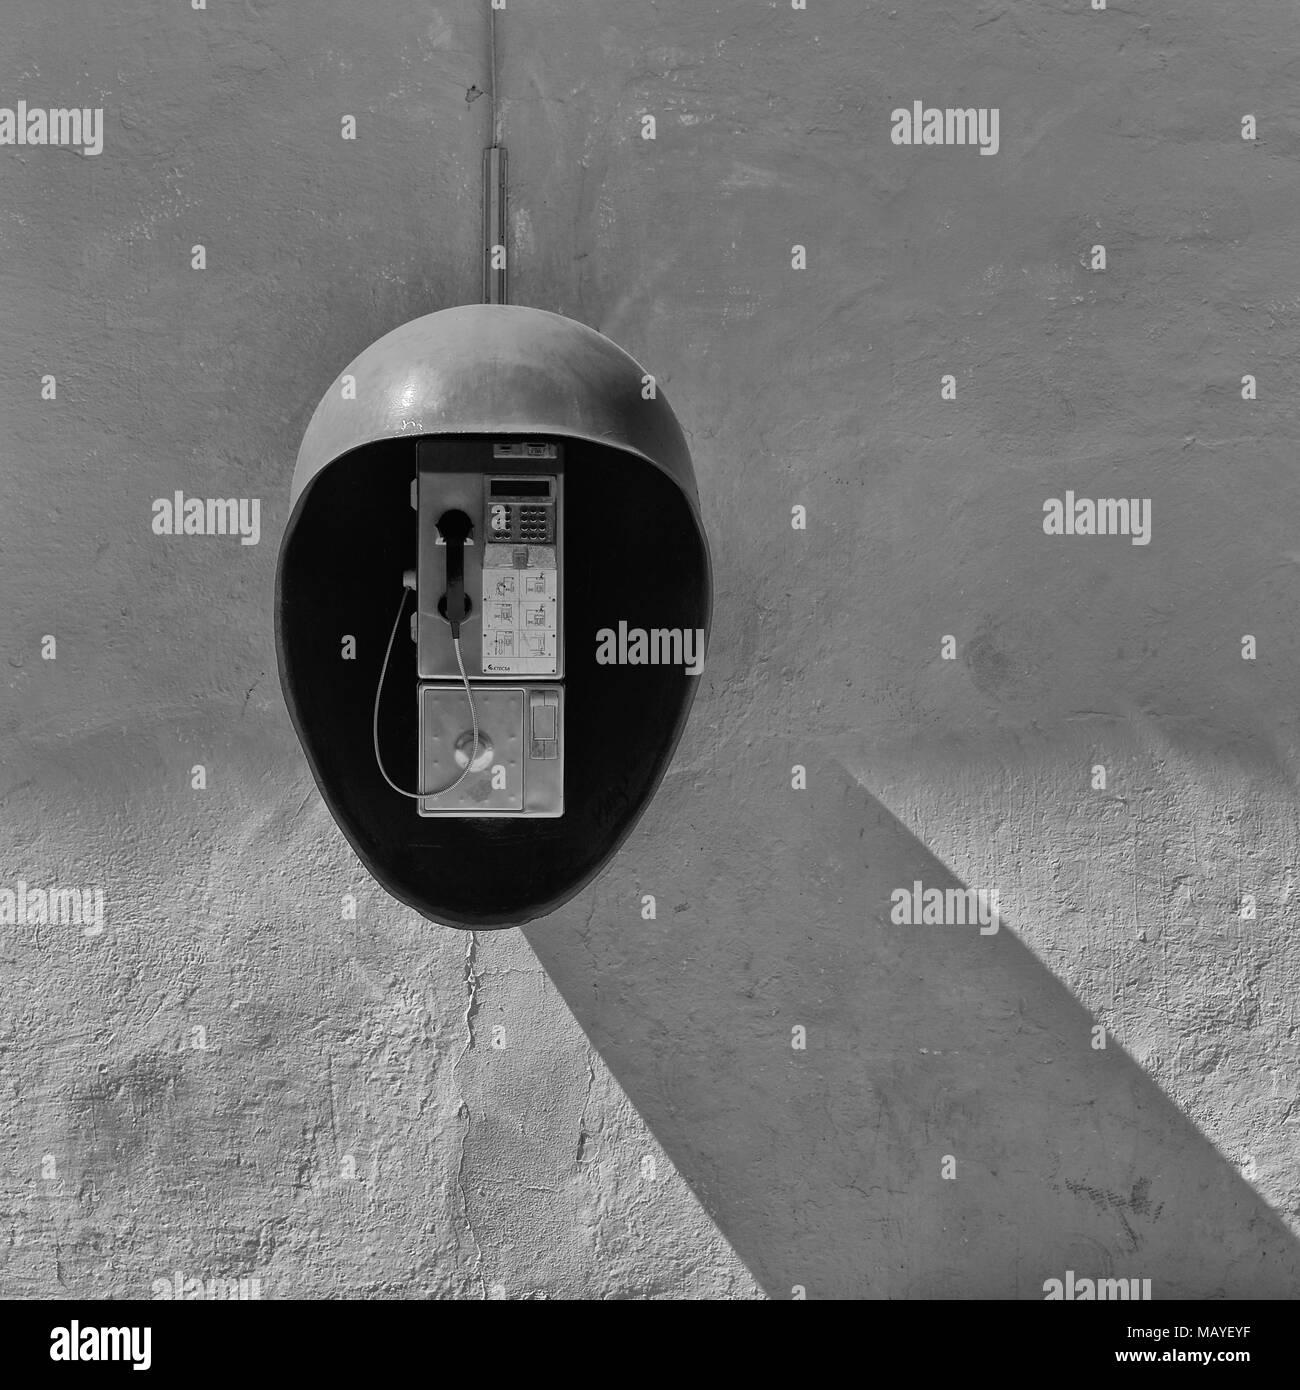 Wall mounted public payphone, Cienfuegos  Cuba, caribbean, - Stock Image